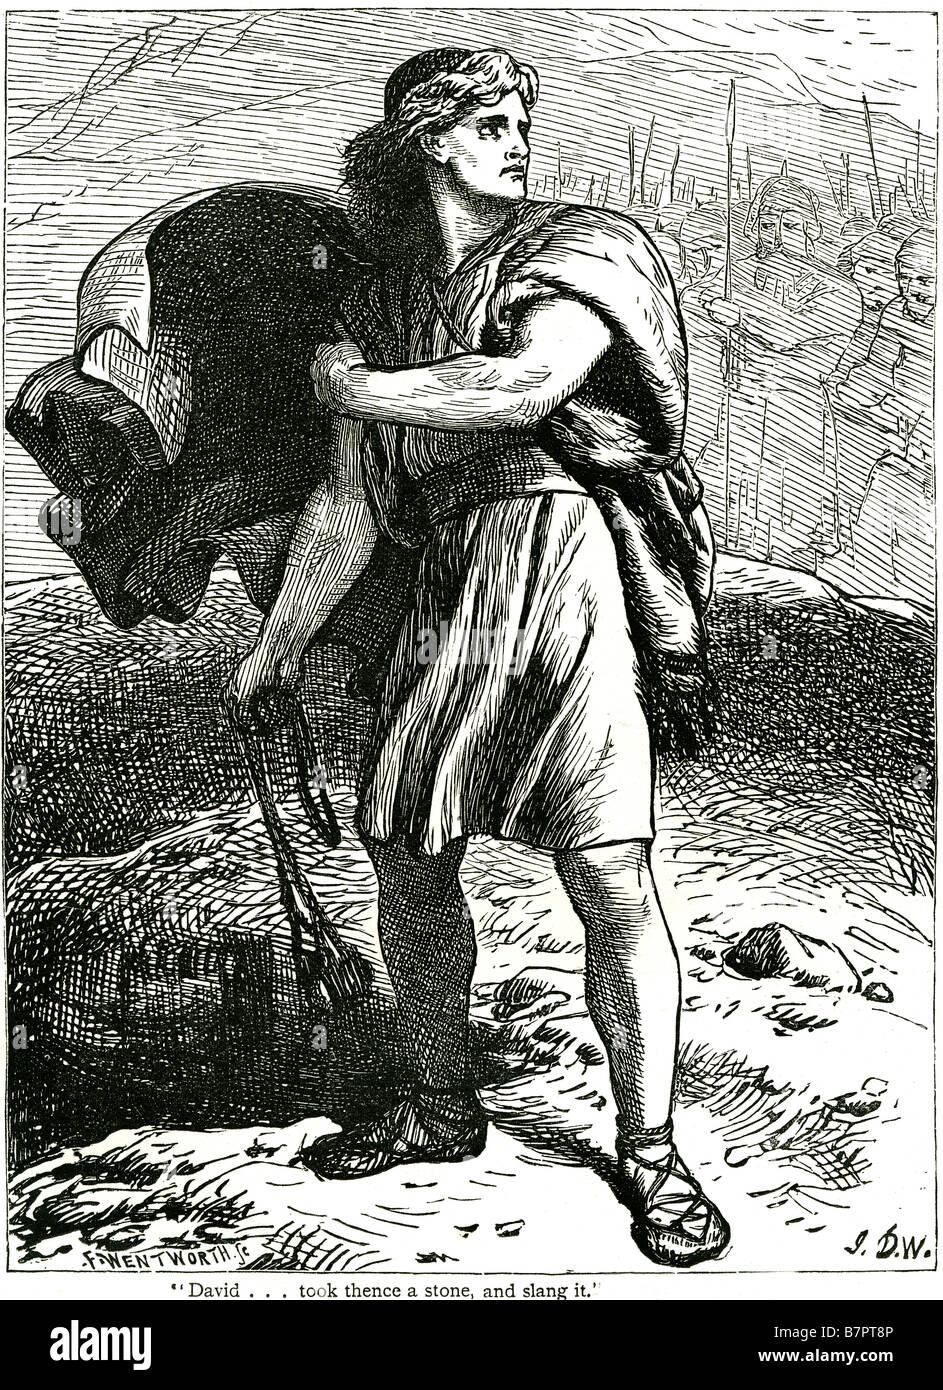 david goliath gath i samuel xvii 49 sling god jesus bible holy